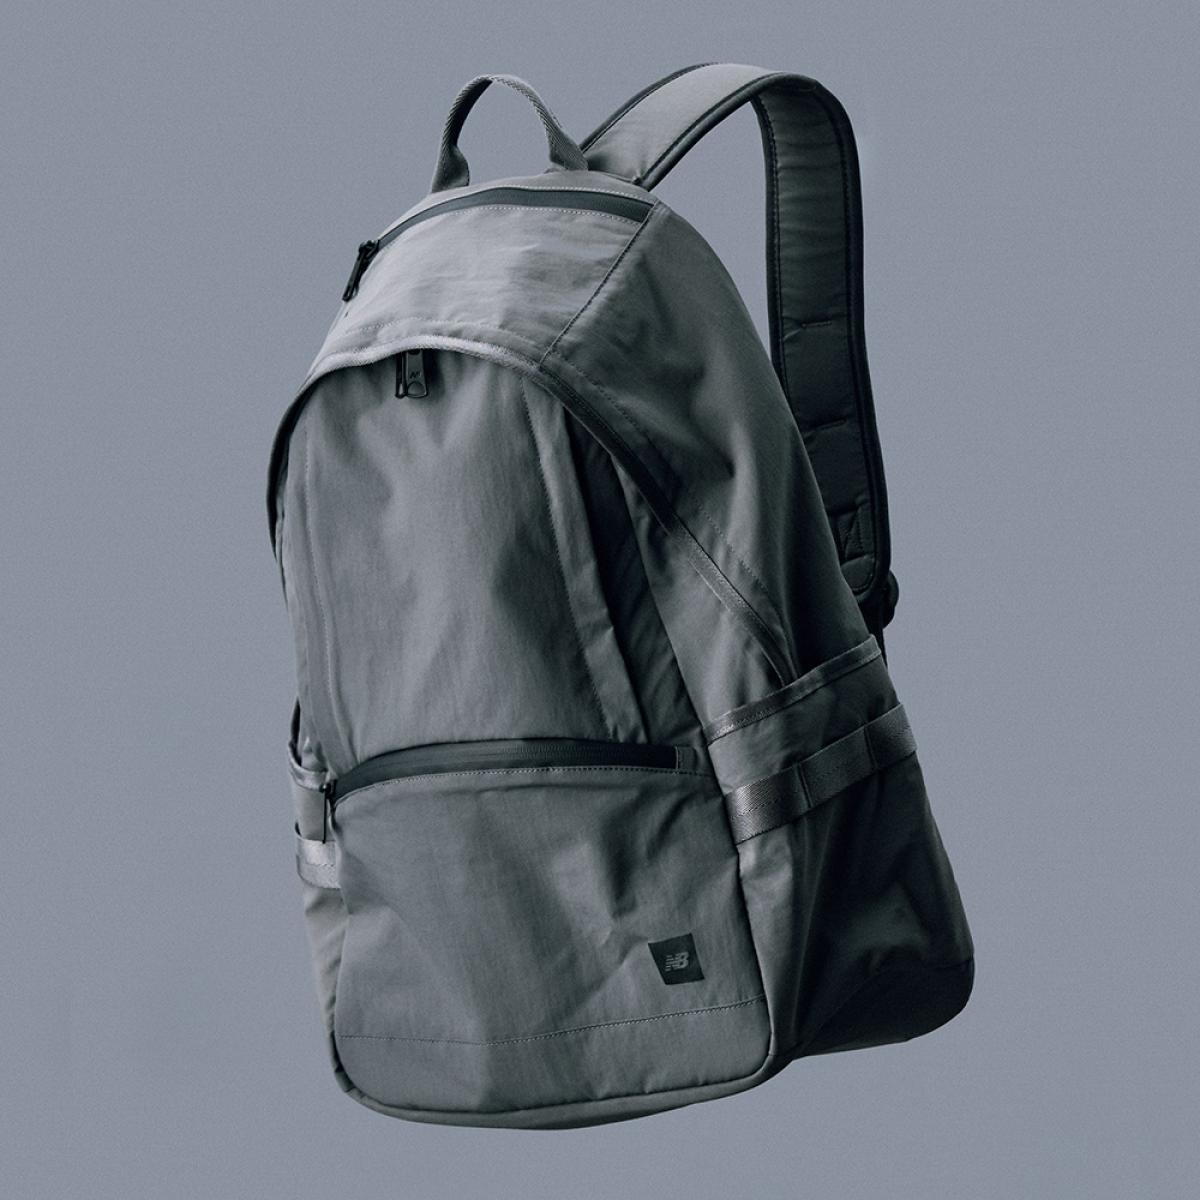 Grey Pack_올라운드 백팩